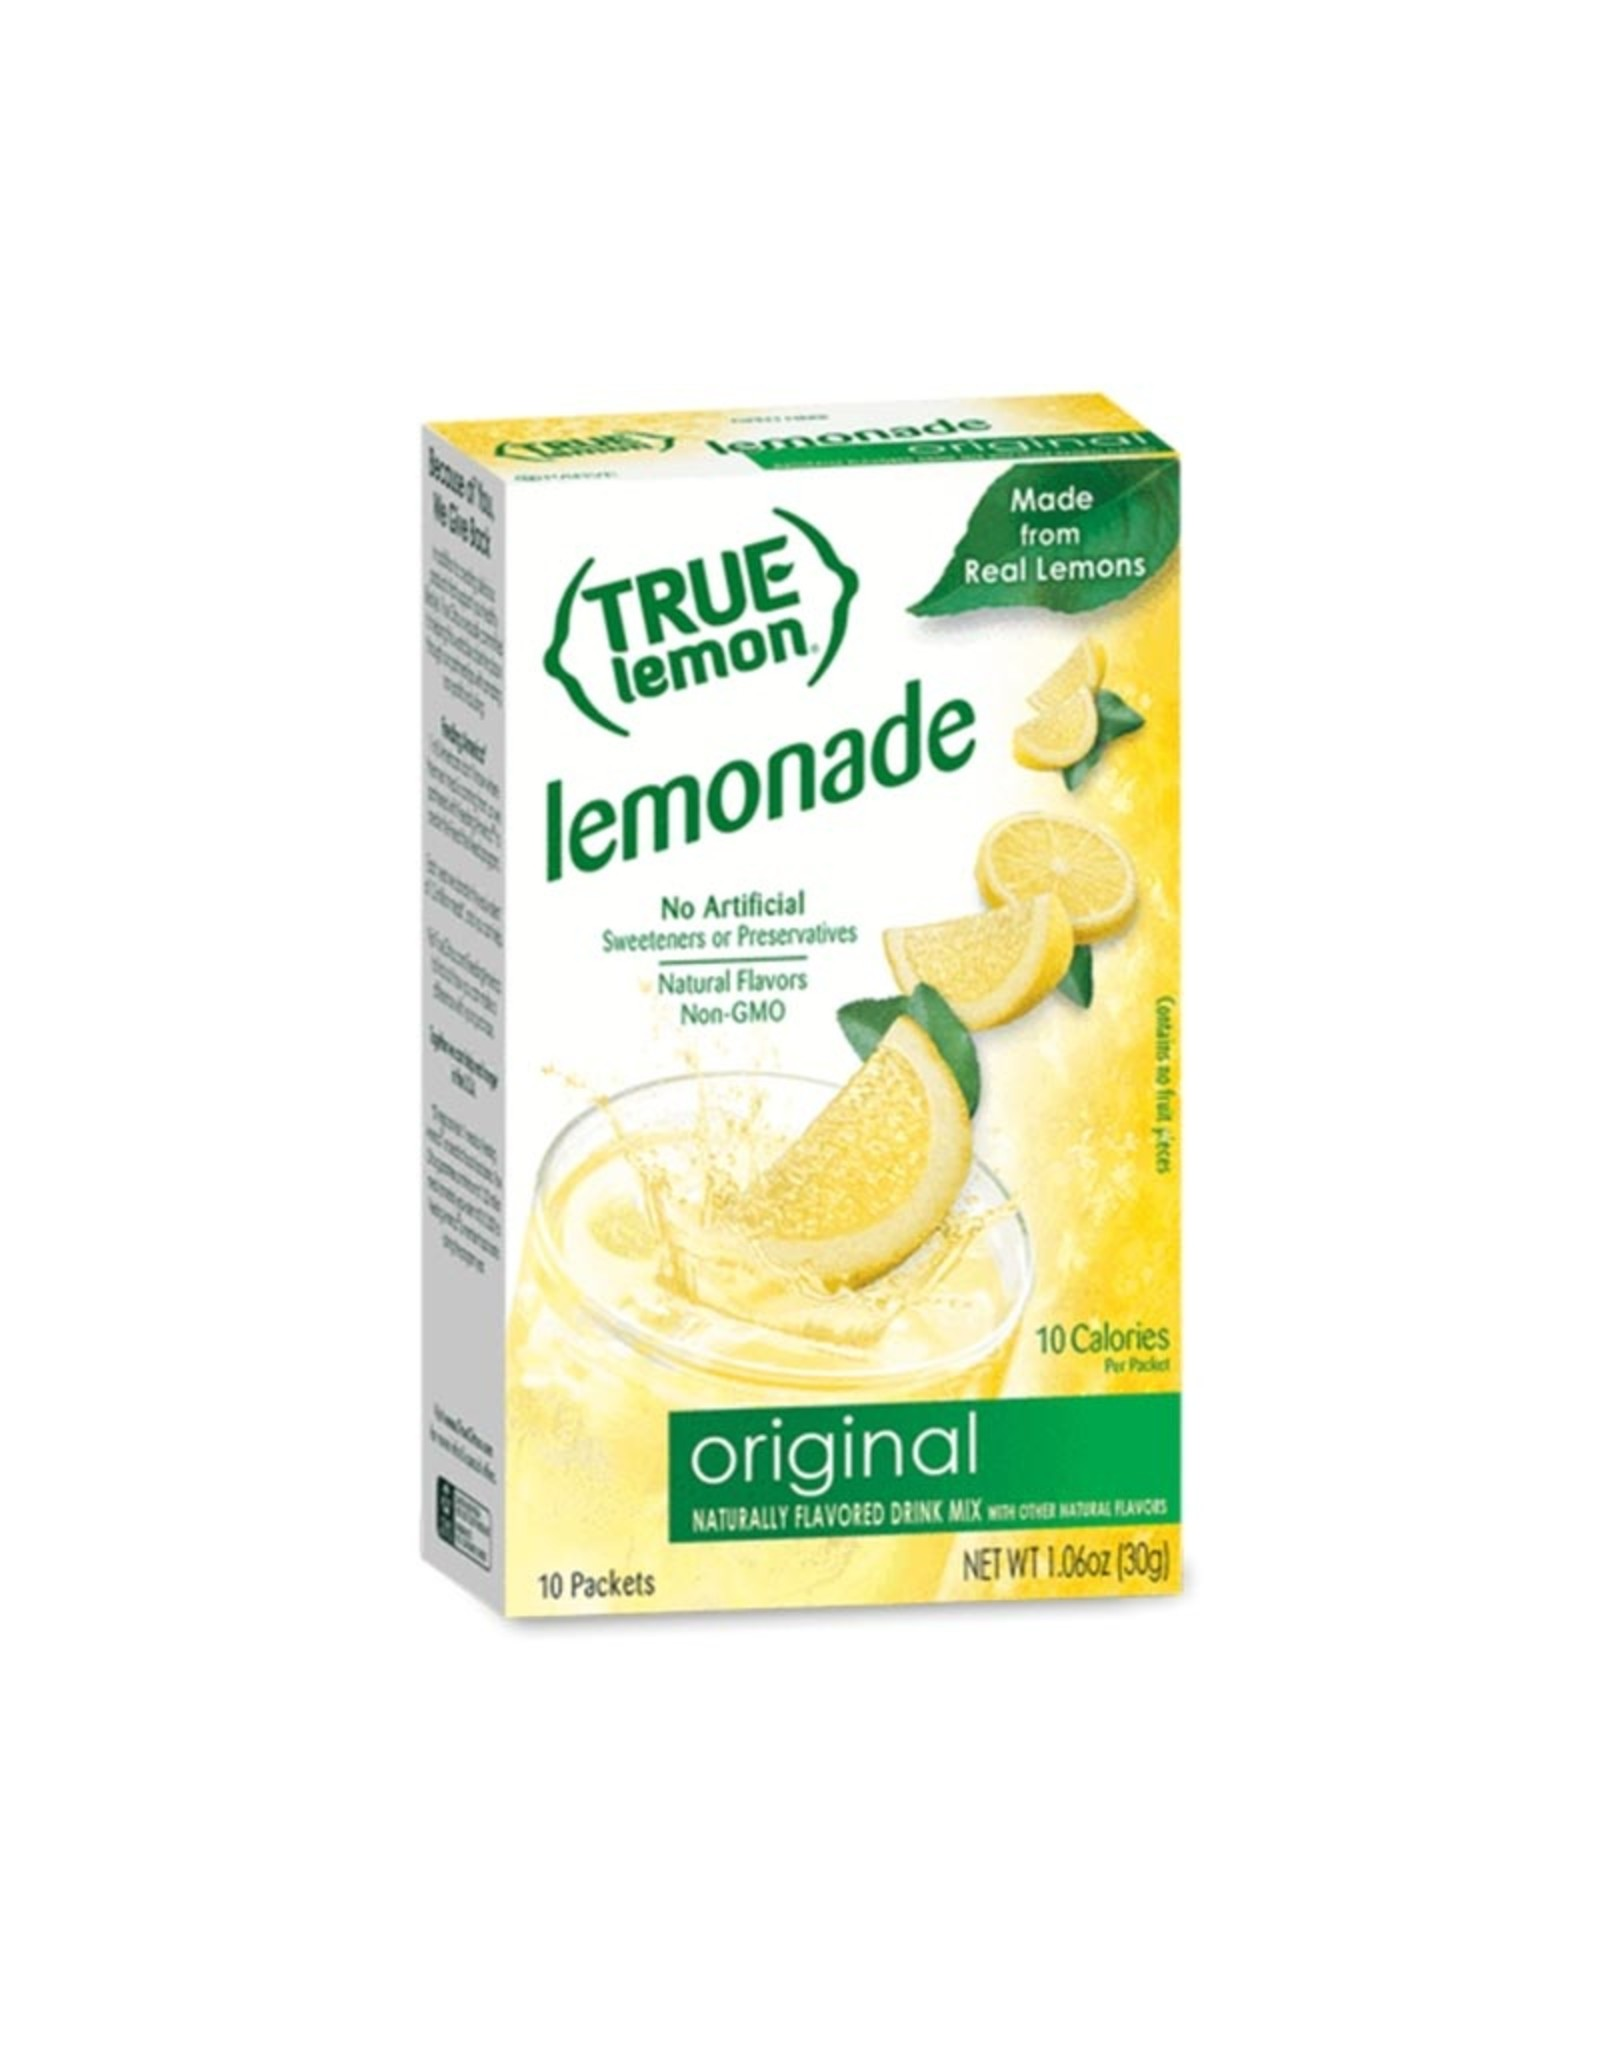 True Lemon True Citrus - True Lemon, Original Lemonade (10pk)